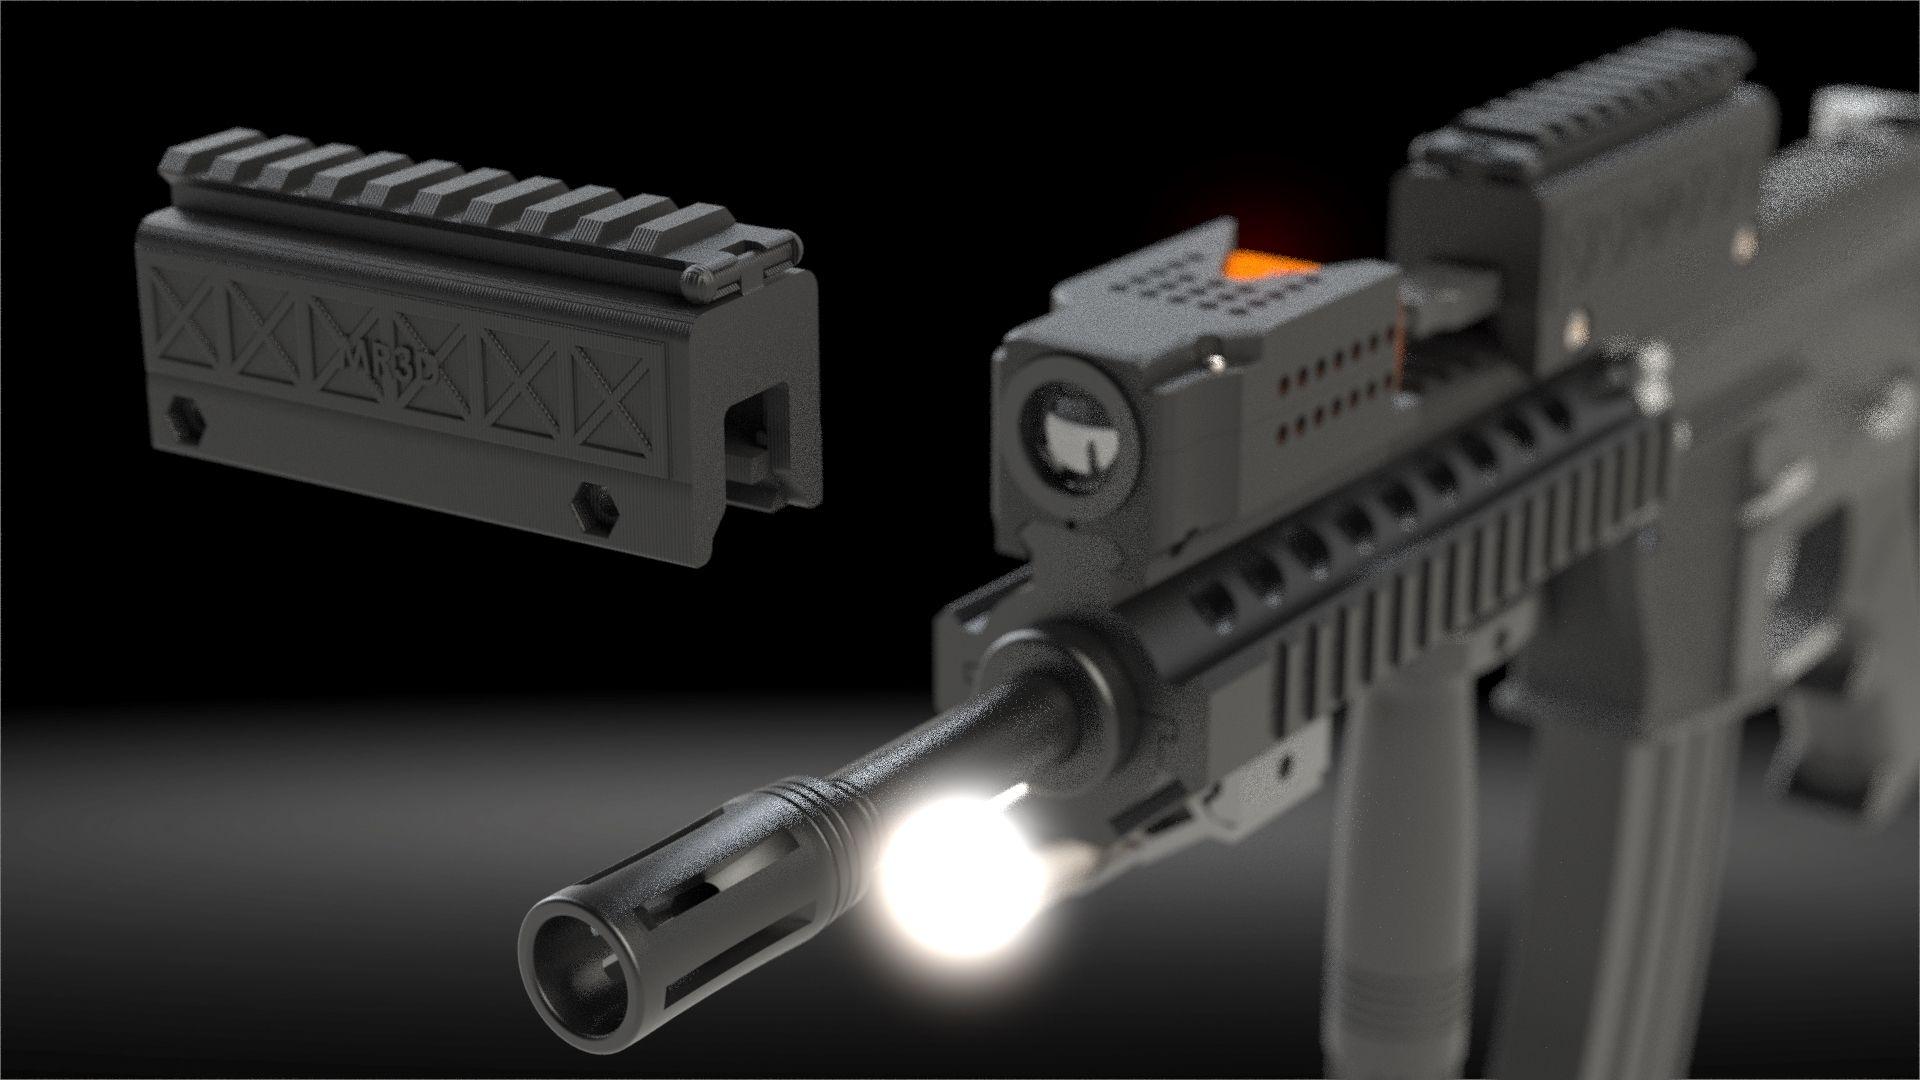 Custom 3D printed battery railmounted case for airsoft gun